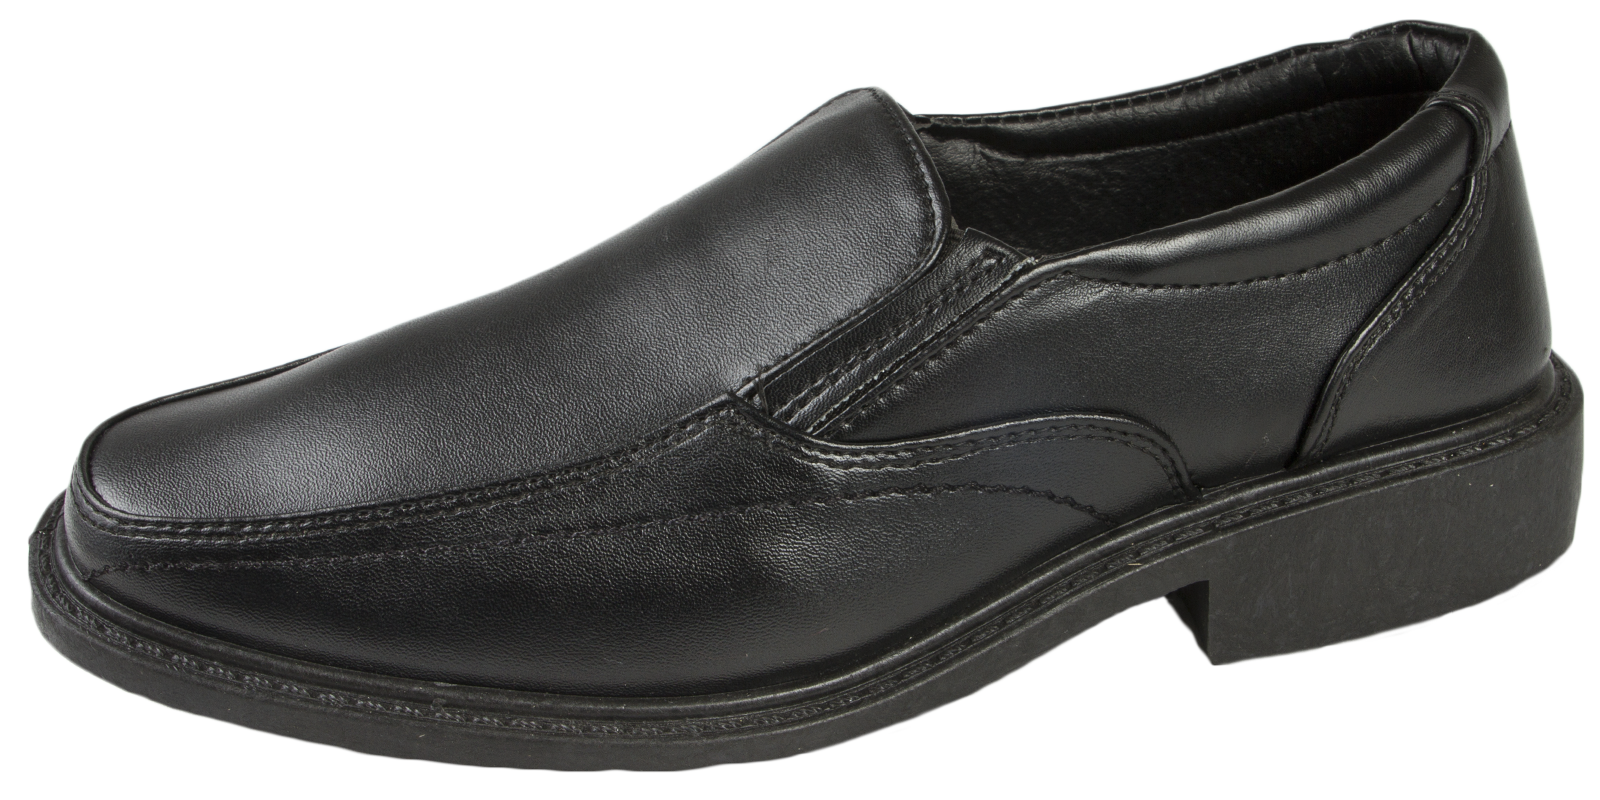 boys faux leather formal dress shoes slip on wedding shoe